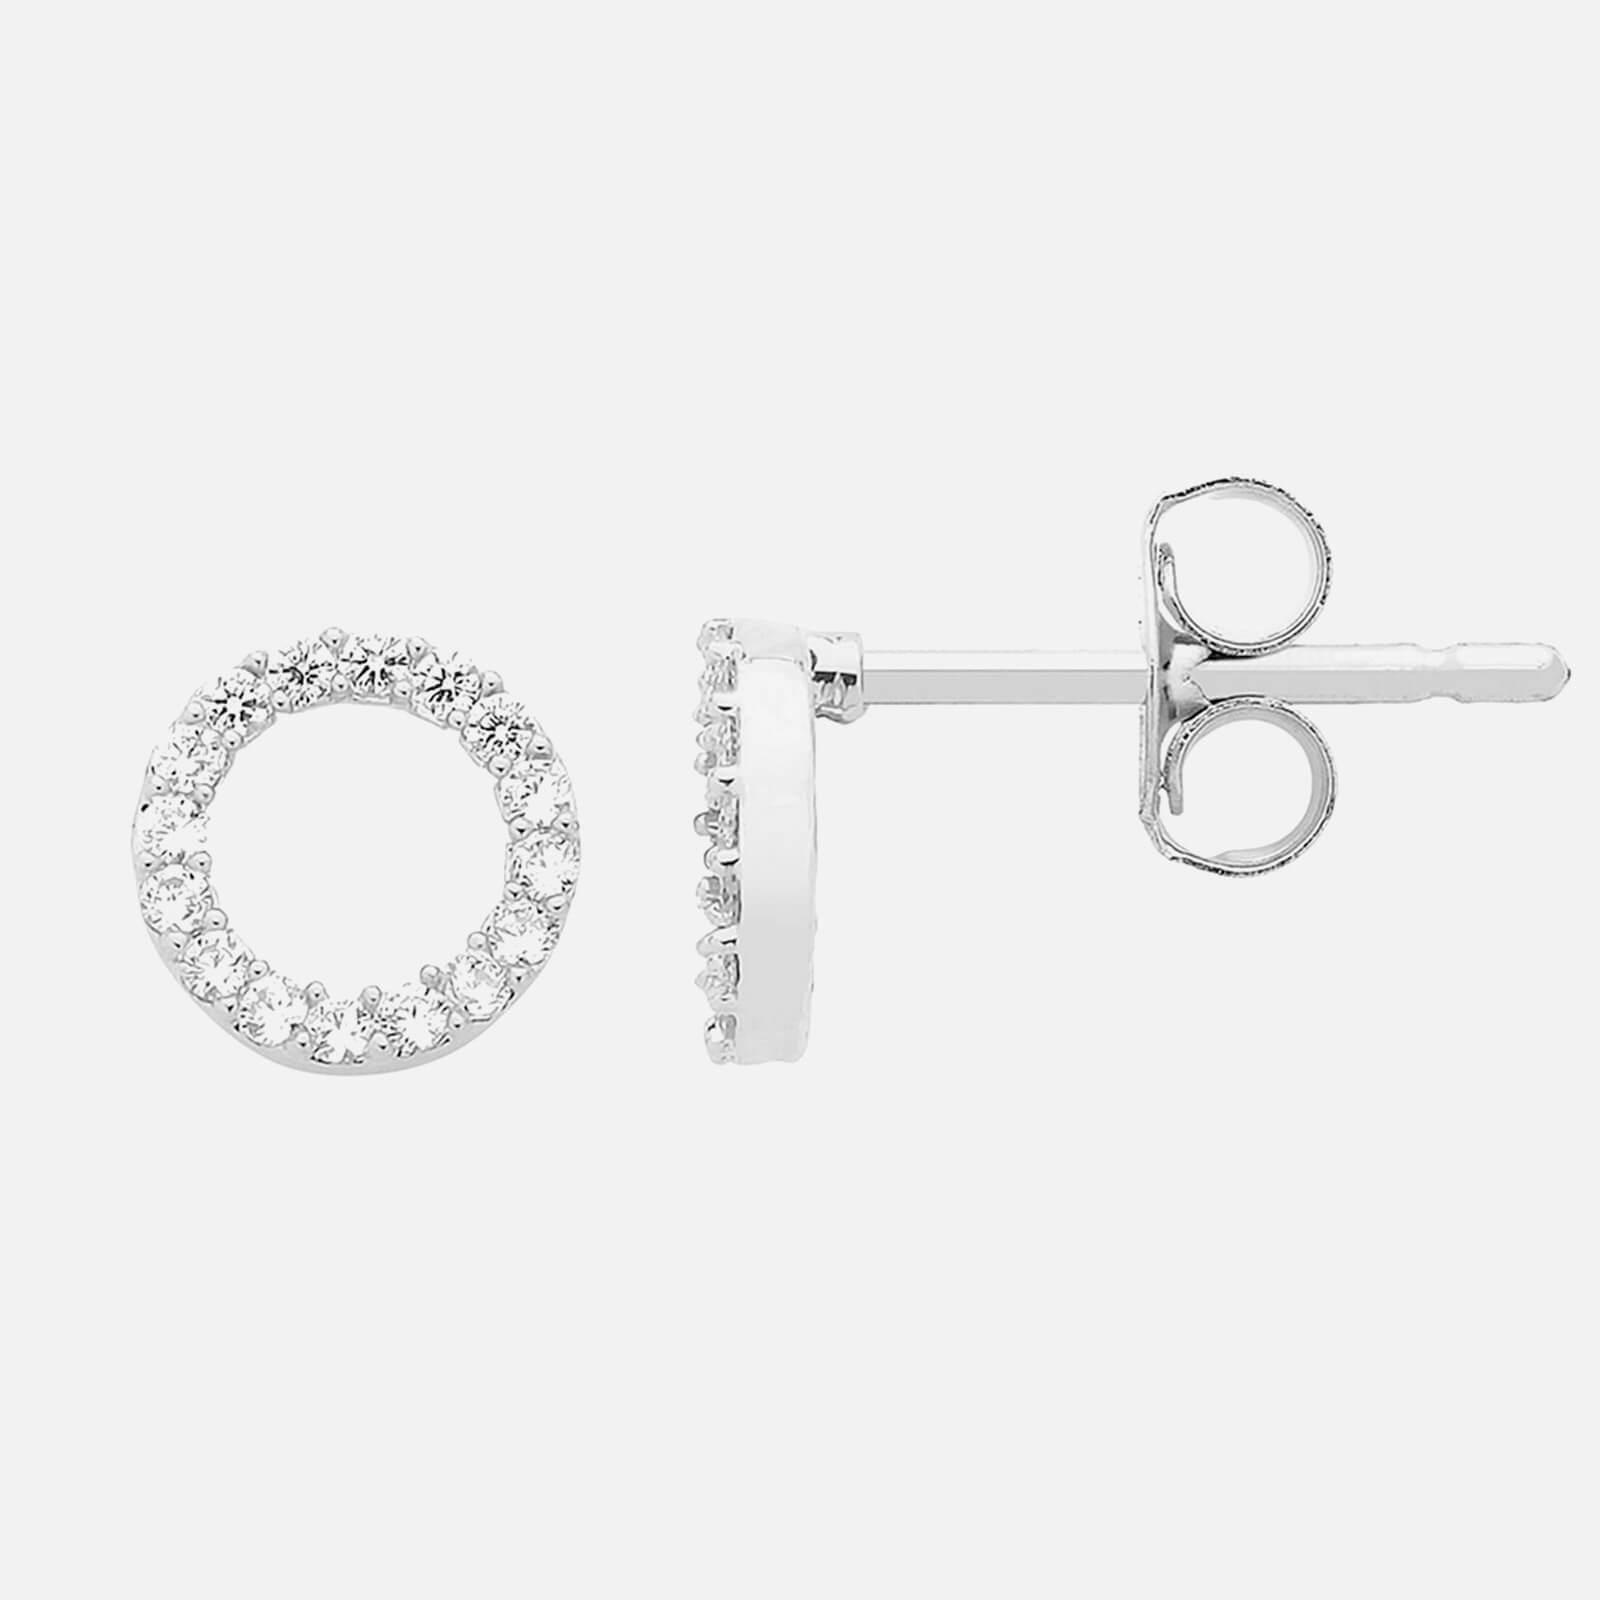 Estella Bartlett Women's CZ Circle Earrings - Silver Plated/NP